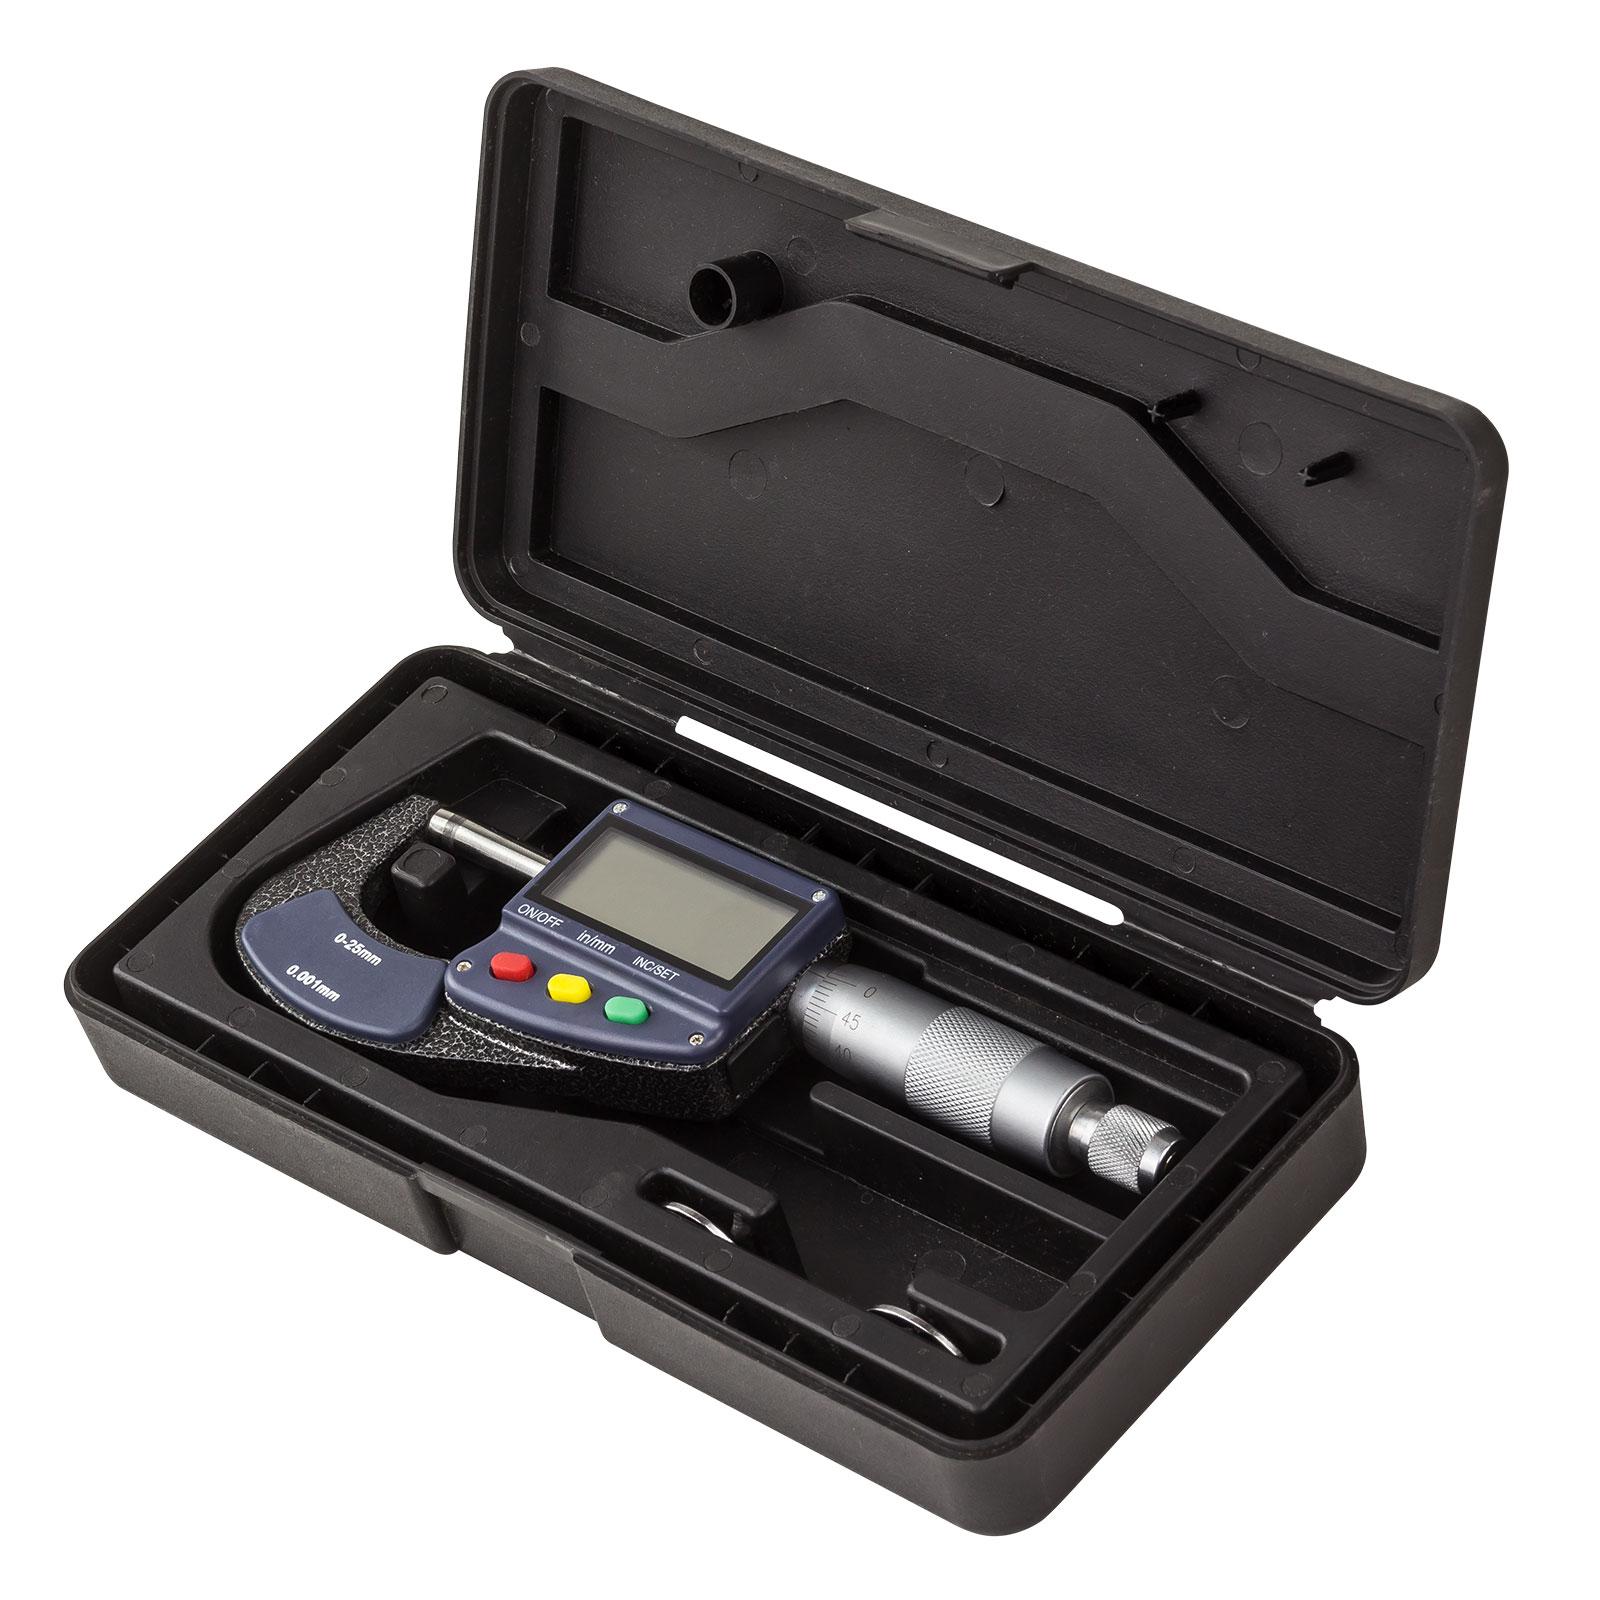 Dema Digital Mikrometer / Bügelmessschraube 0-25 mm 25322